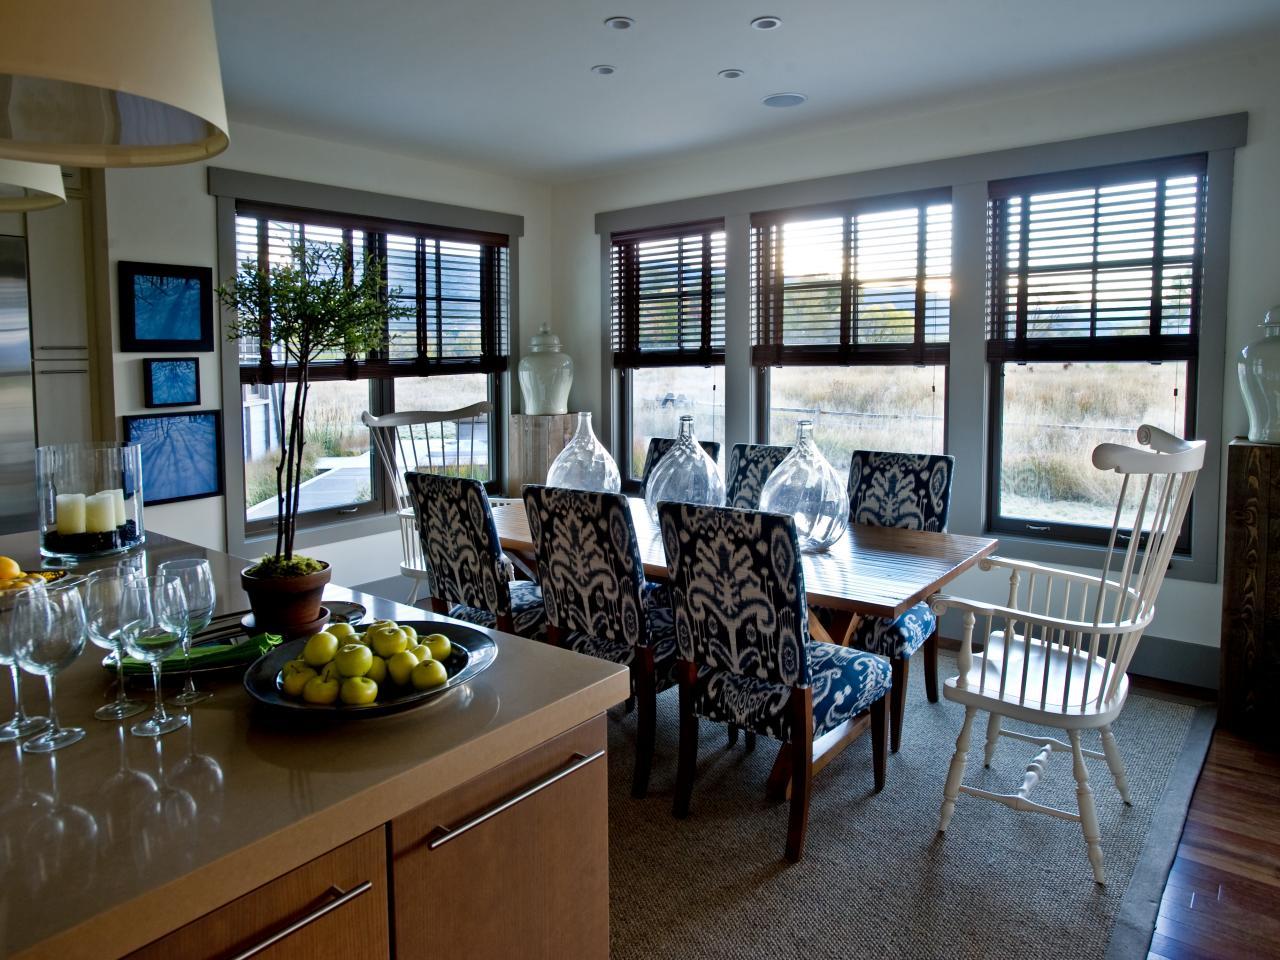 Modern Dining Rooms 2012 pick your favorite dining room | hgtv dream home 2017 | hgtv